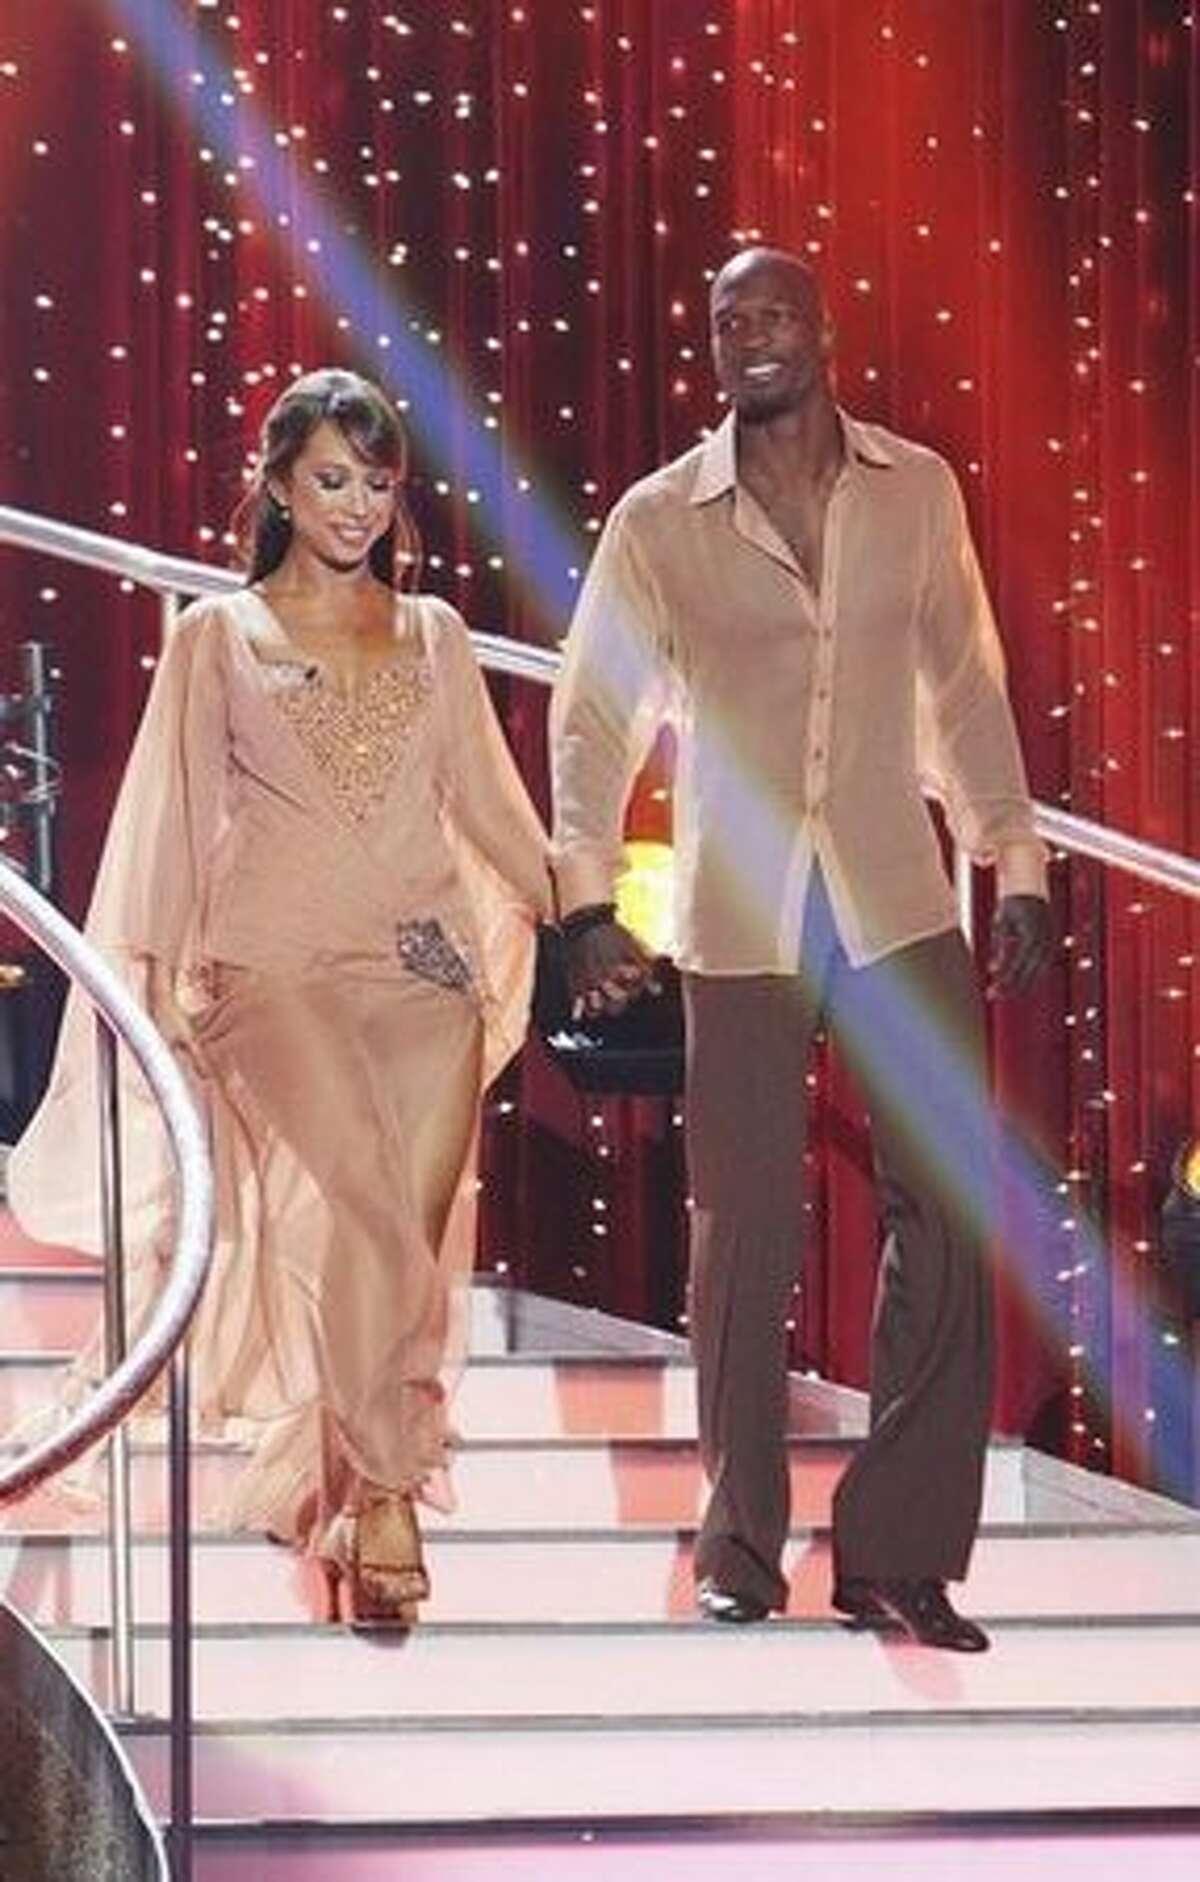 Pro football player Chad Ochocino and his partner, professional dancer Cheryl Burke.